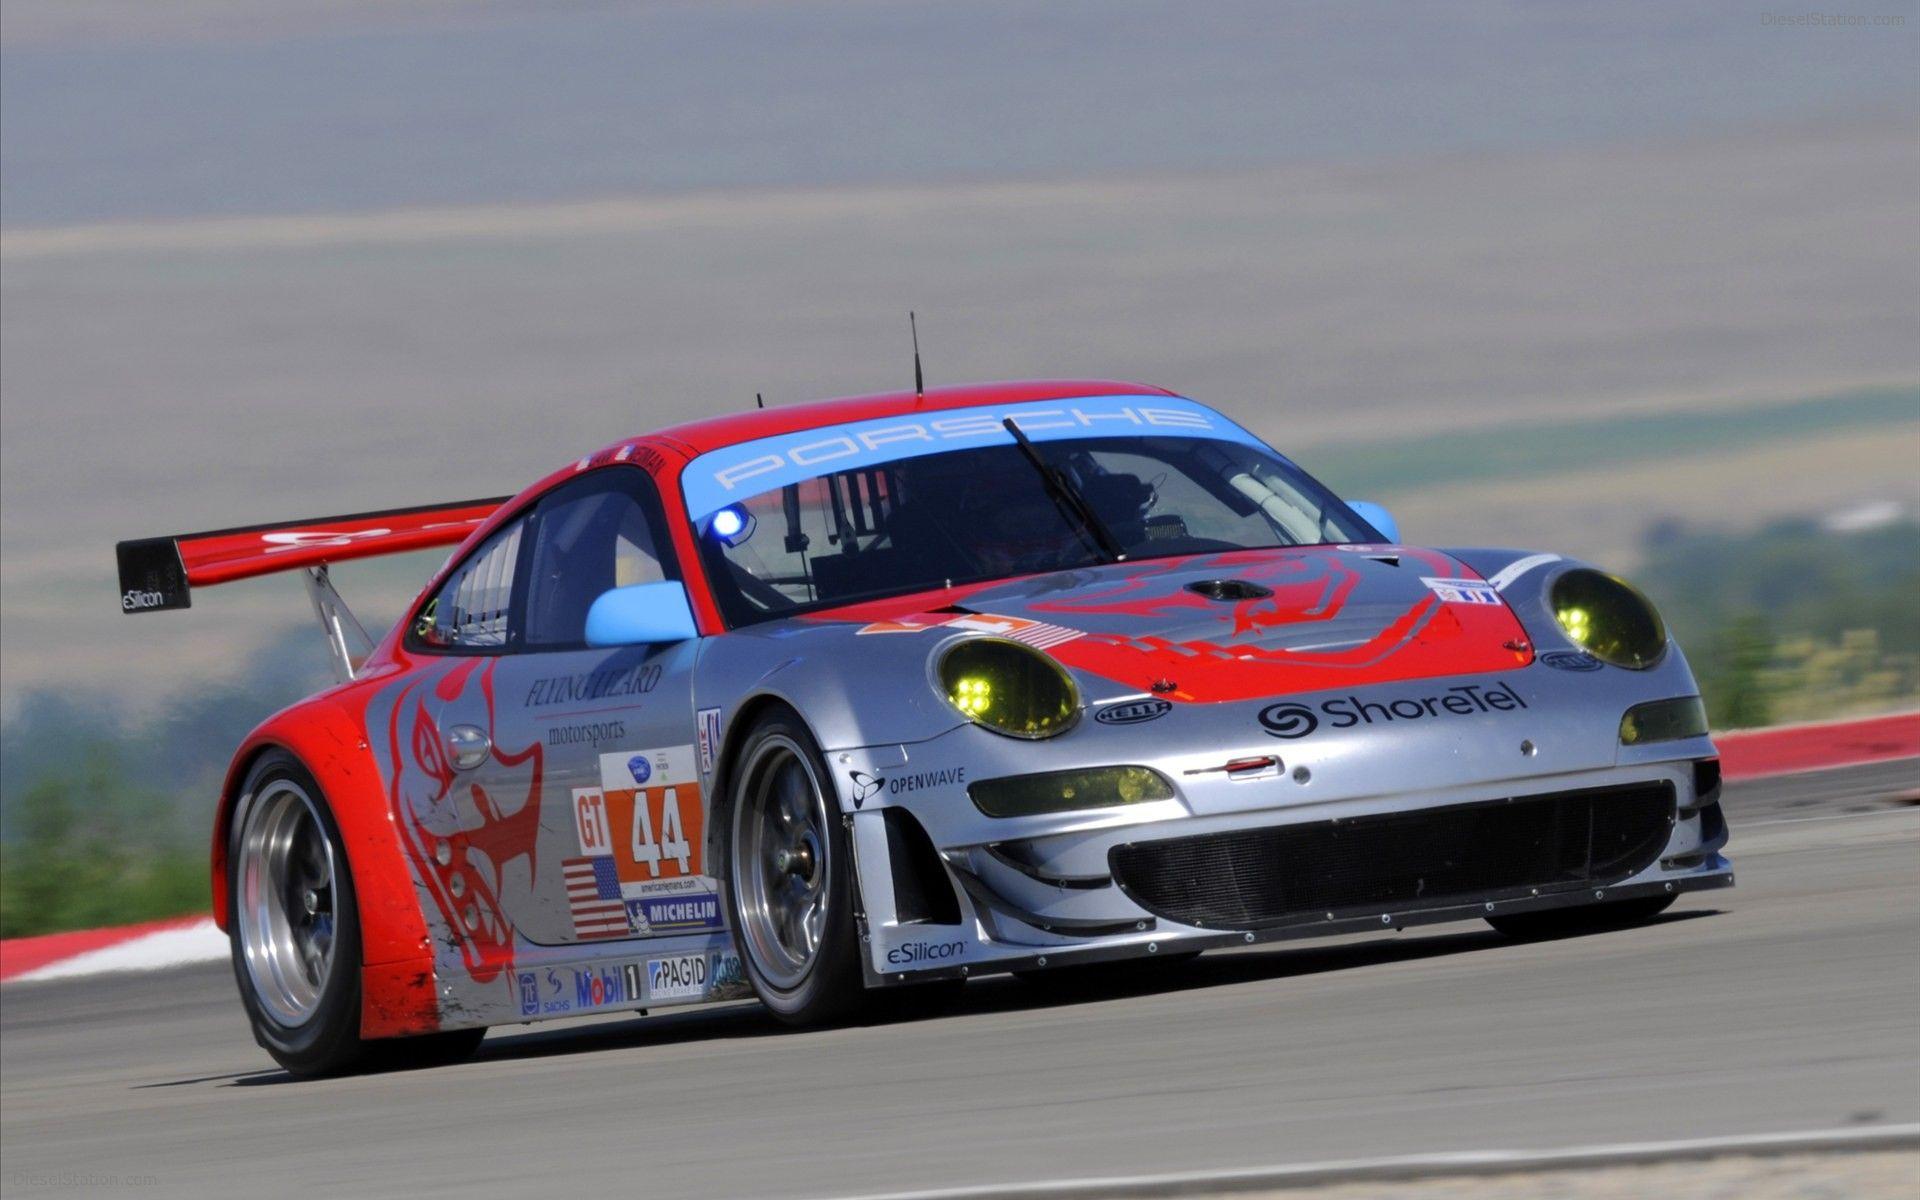 Pin by LADA HRDLICKA on Grand Prix Sebring car, Porsche